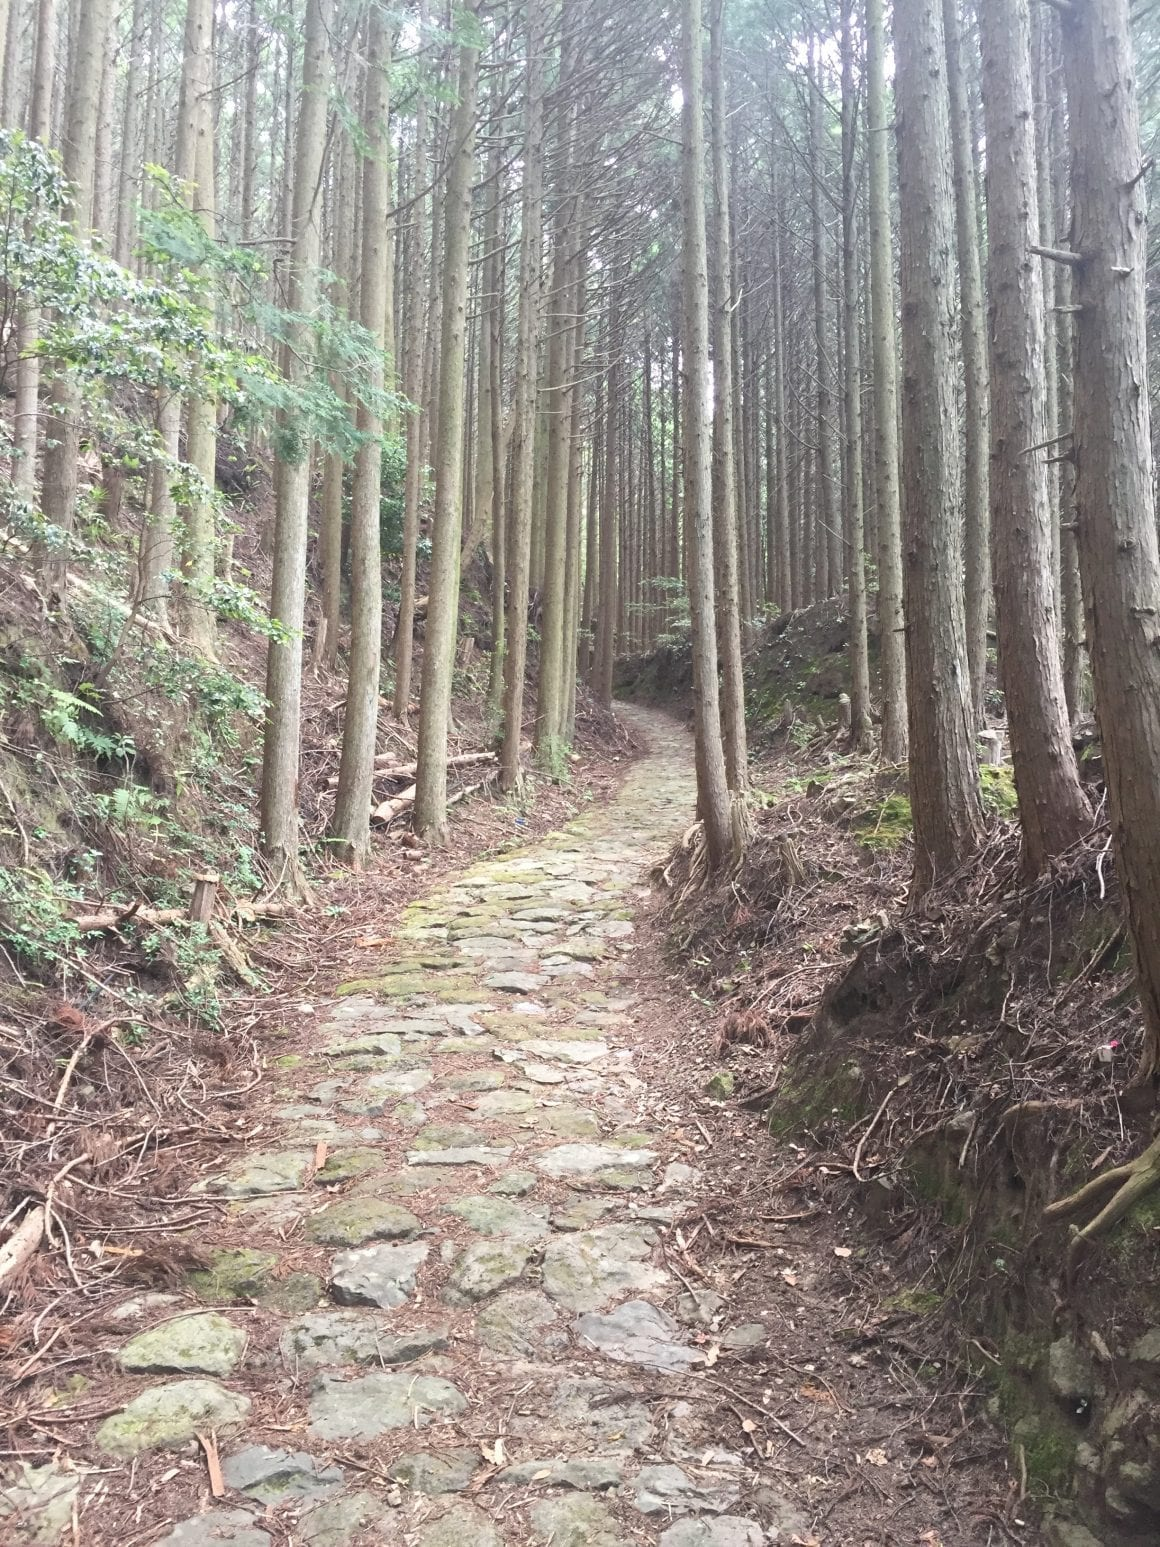 Kumano Kodo Beautiful Roads